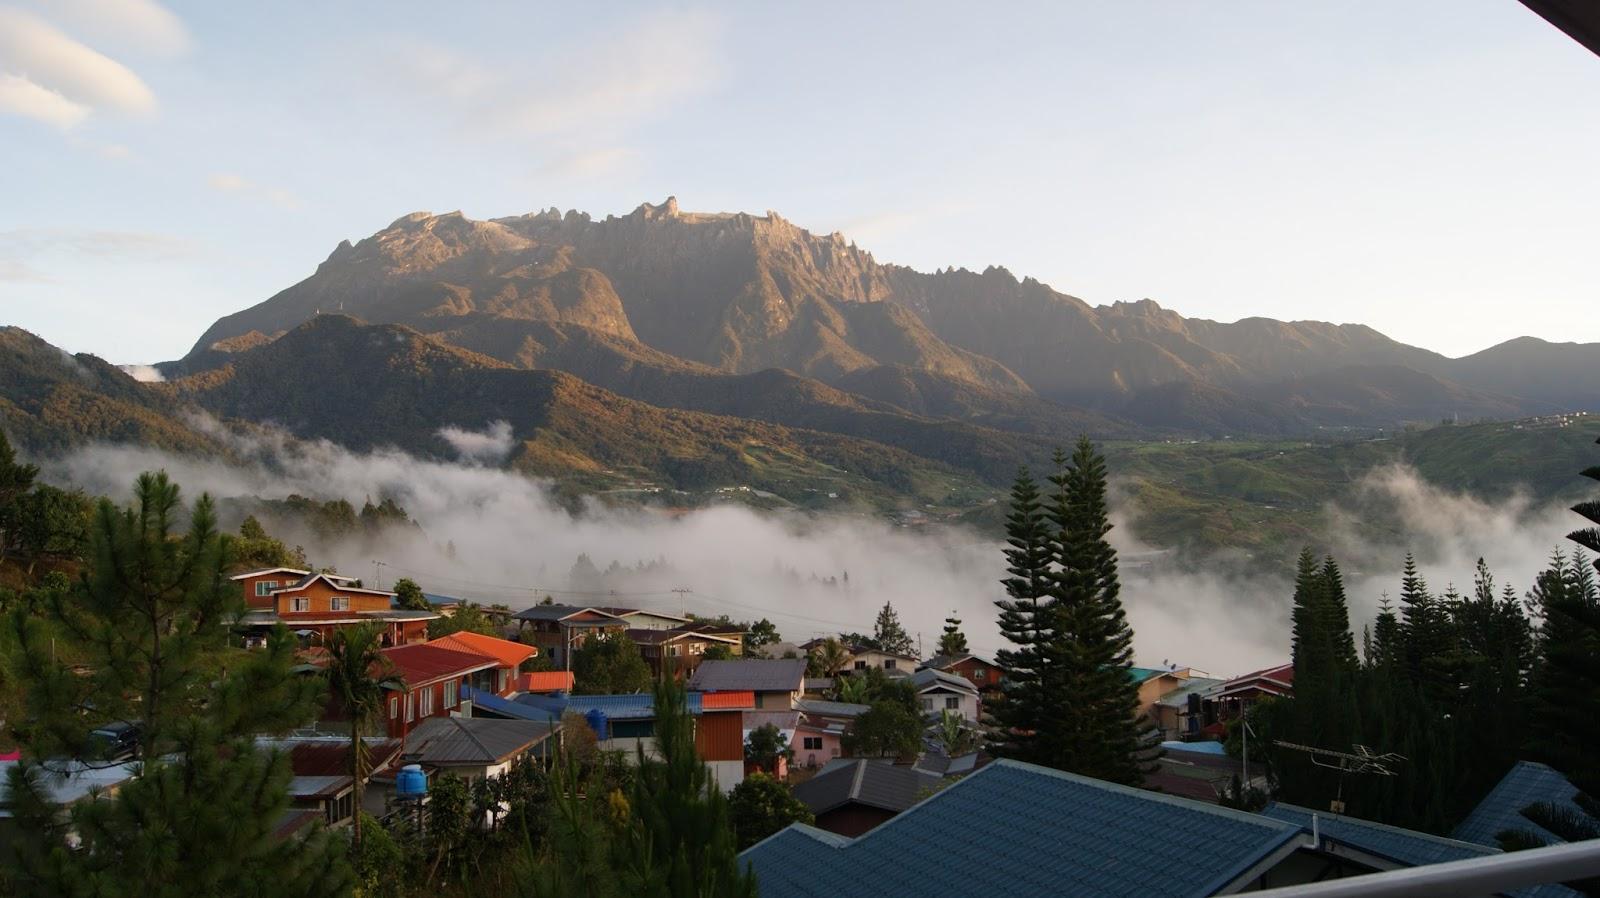 Rasakan Sensasi Mendaki Gunung Tanpa Tenda di Kinabalu